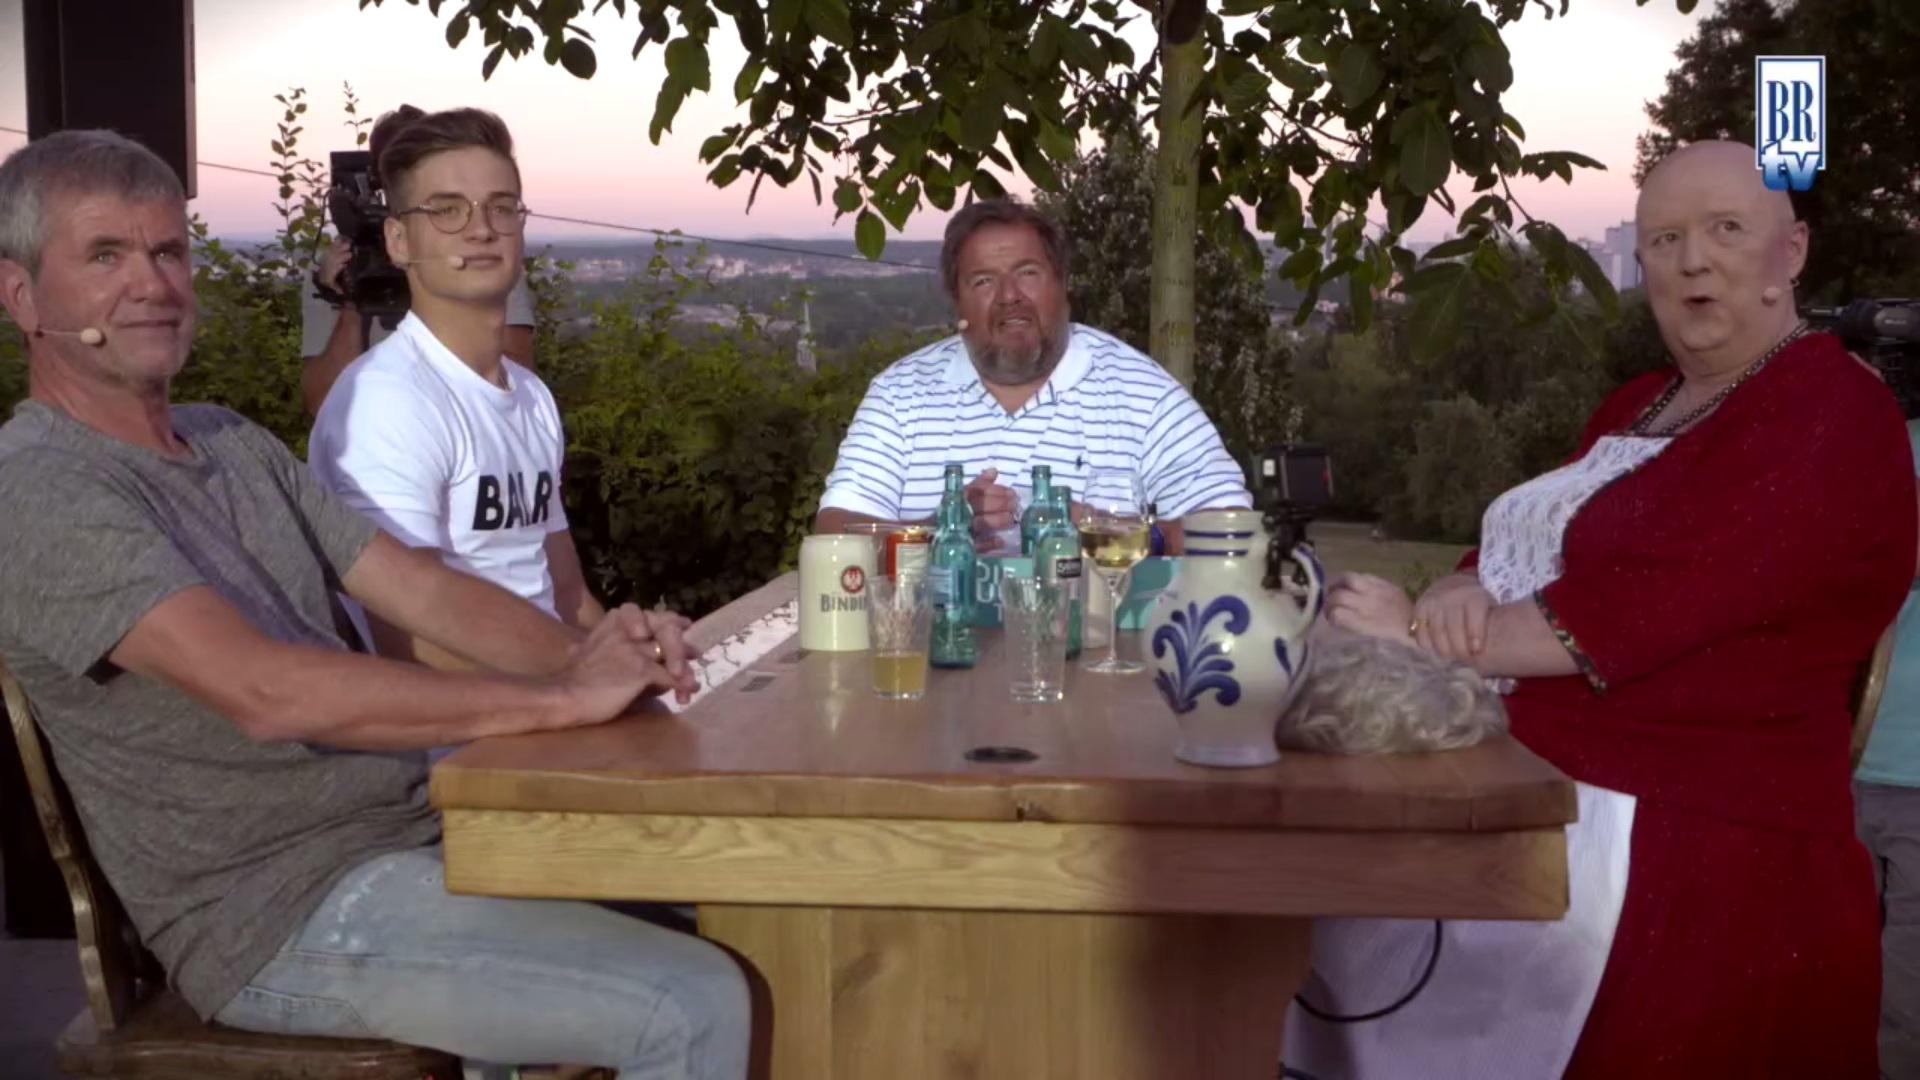 Bembel & Gebabbel – Folge 53 mit Friedhelm Funkel, Thomas Bäppler-Wolf, Luca Cinqueoncie, Silvio D´Anza & Enzo Grecob